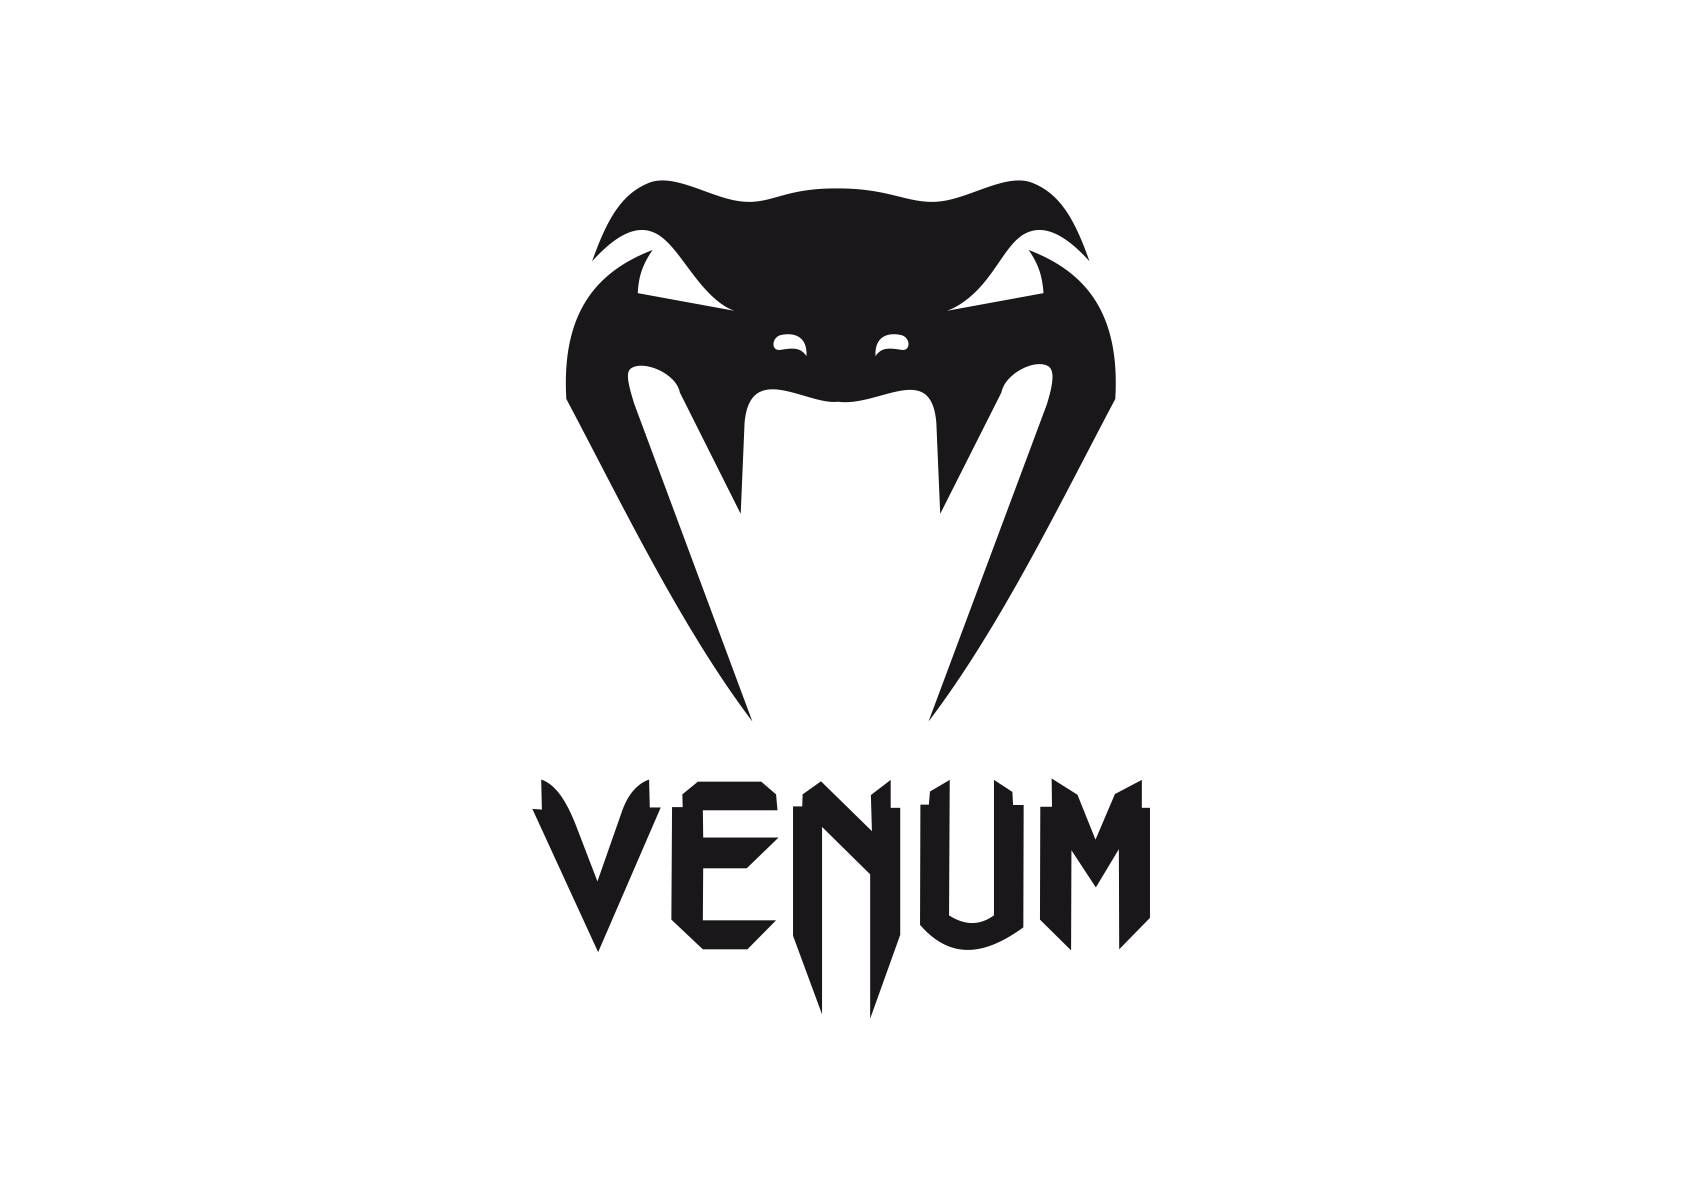 venum fightwear mixed martial arts brand logo logo